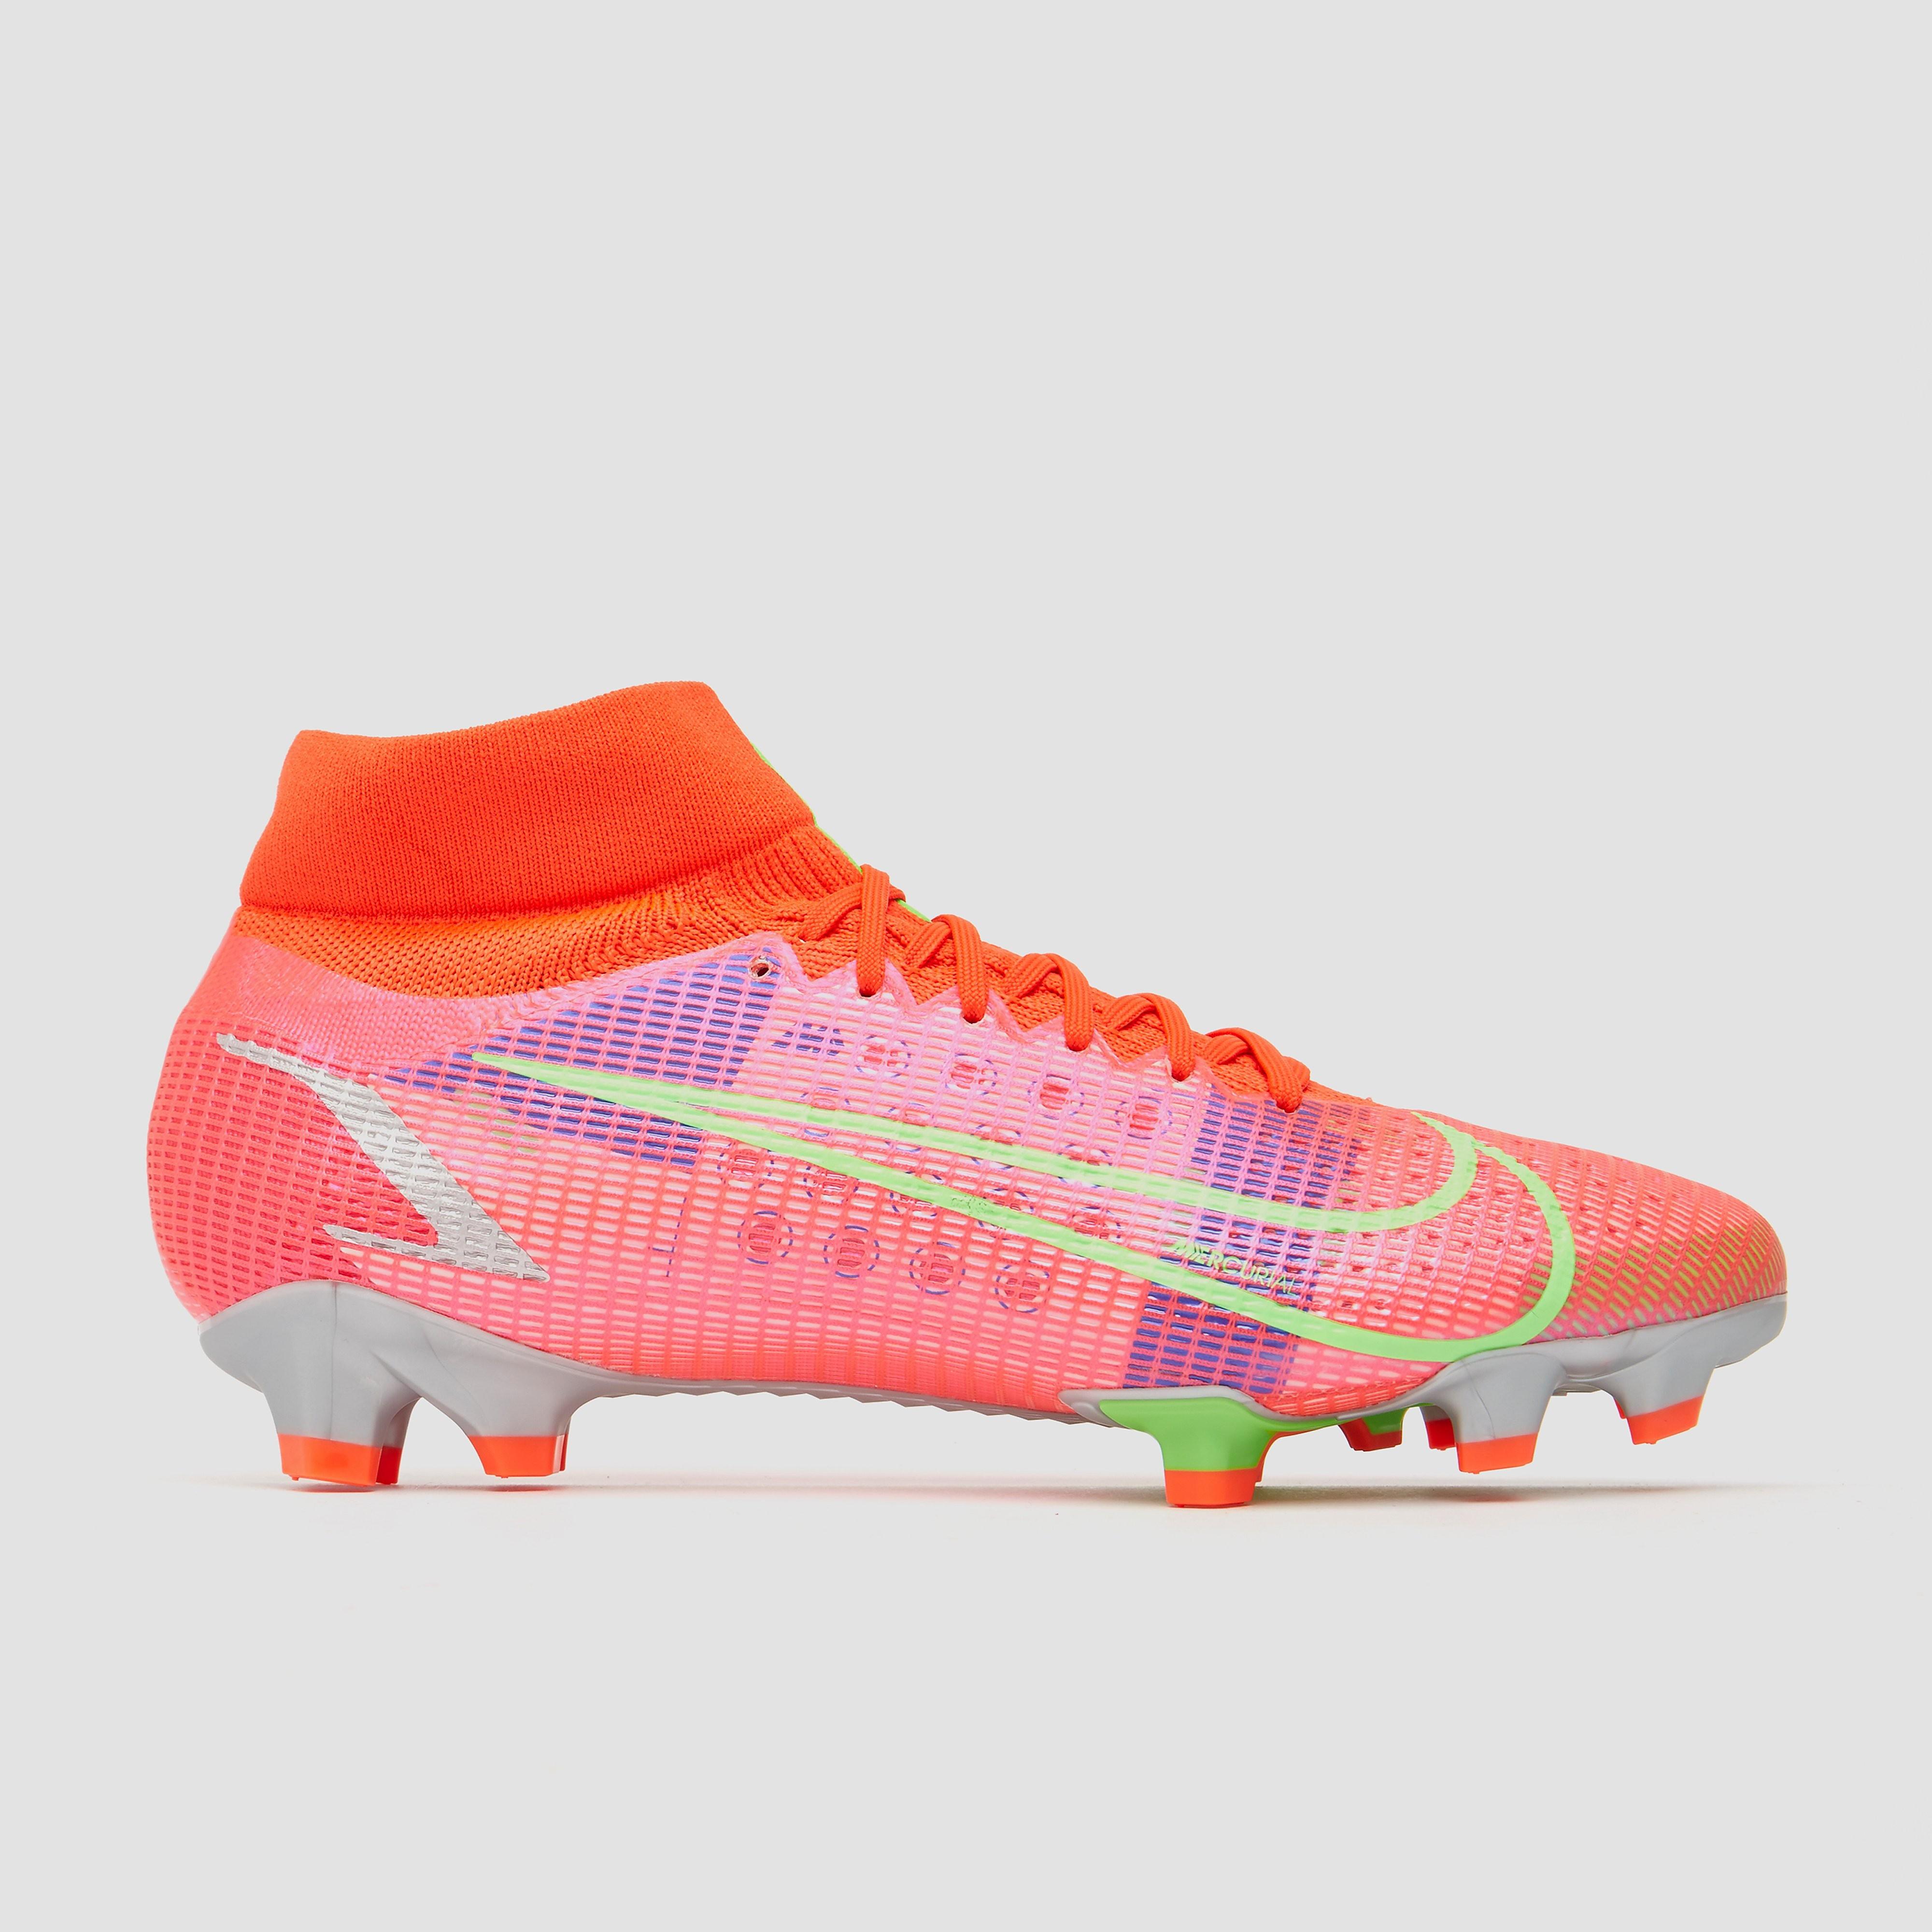 NIKE Mercurial superfly 8 pro df fg voetbalschoenen rood Dames